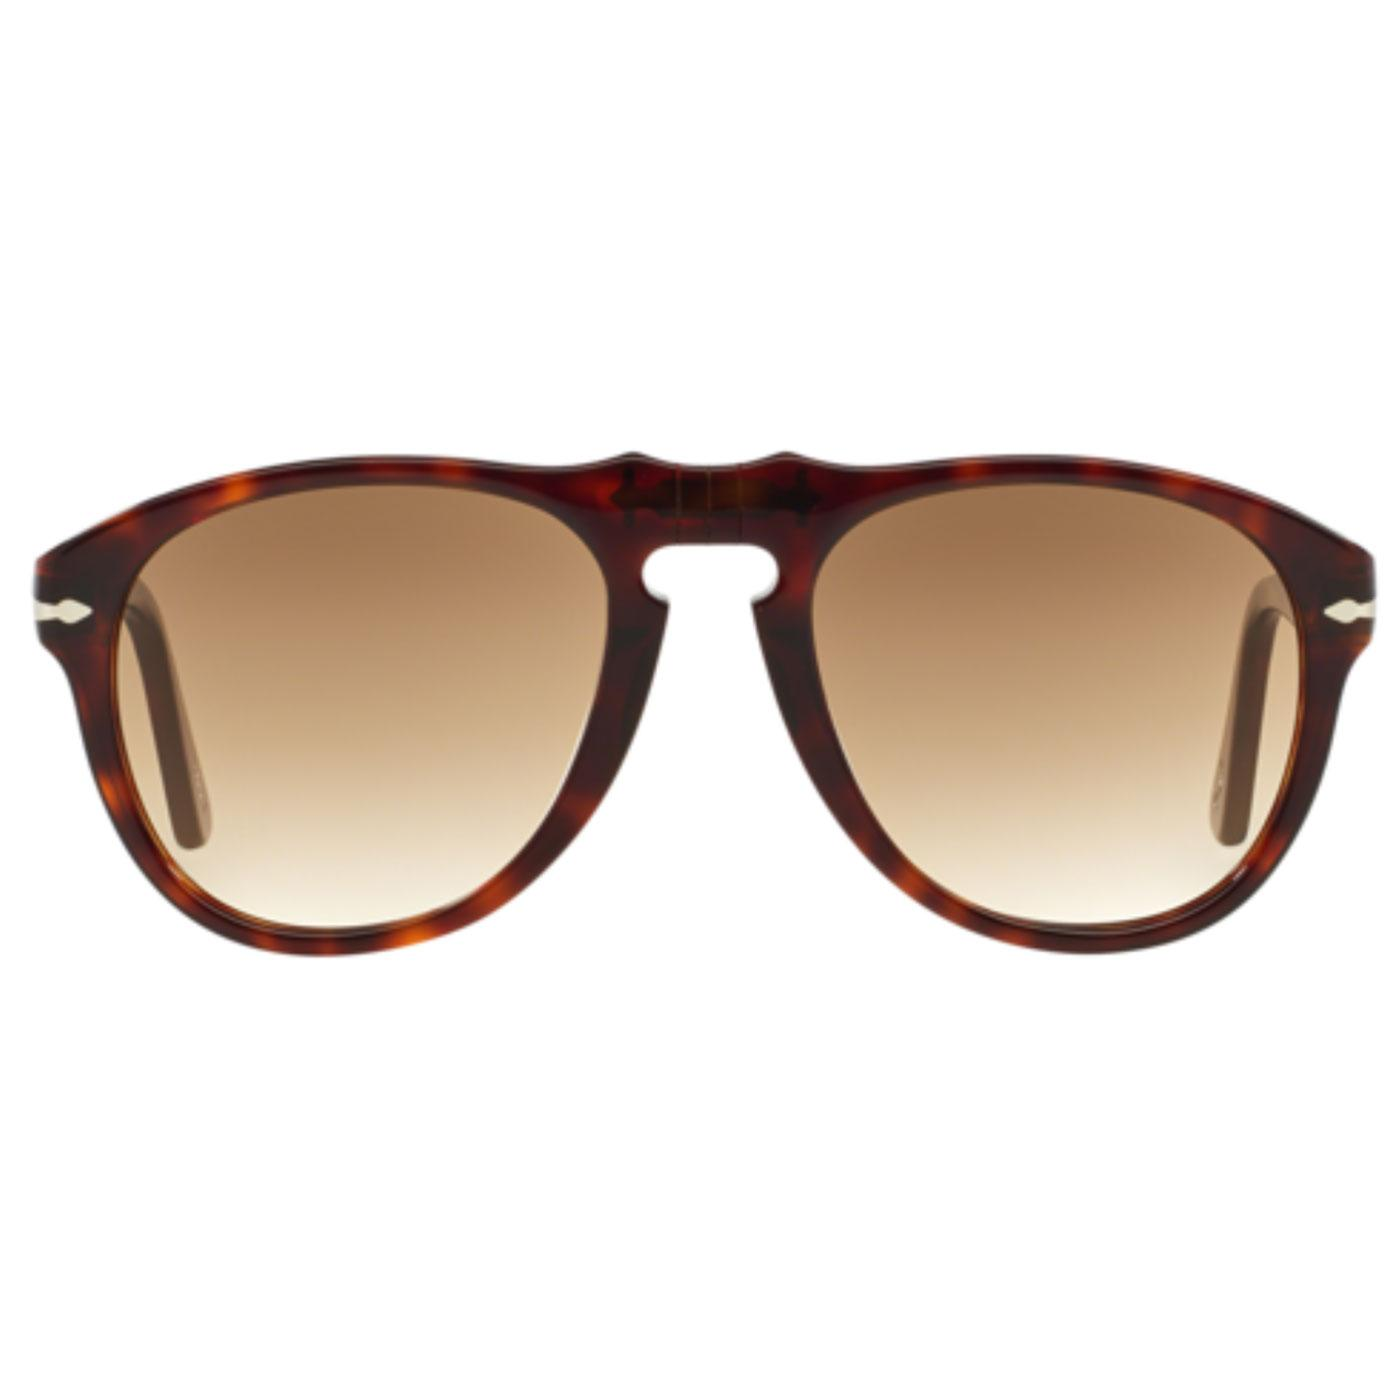 7347335c280bd PERSOL 649 Series Original Mens Mod Sunglasses in Havana